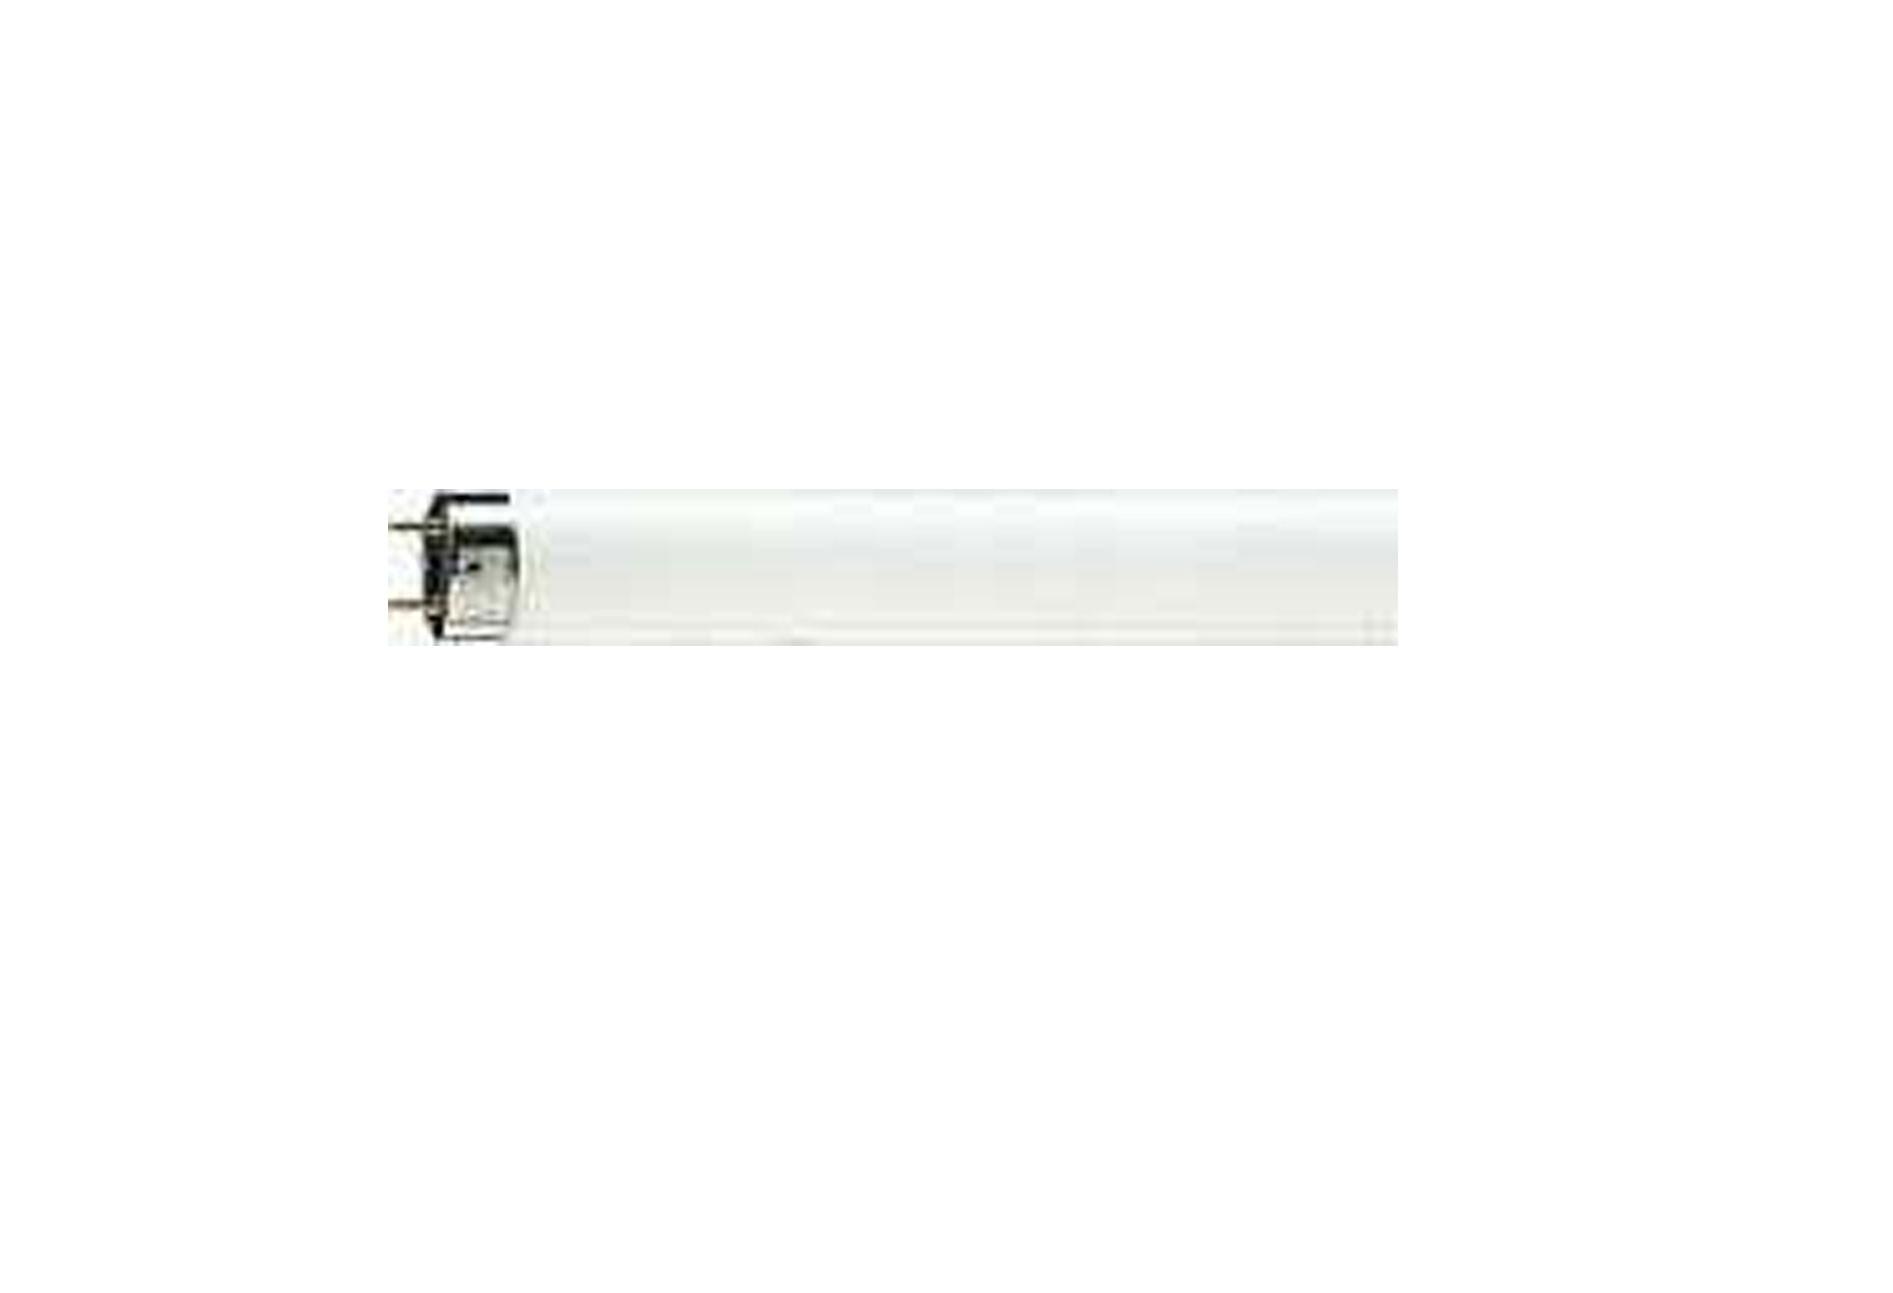 Philips Leuchtstofflampe EcoTL SUPER 80 58Watt 865 dimmbar L 1514mm Bild 1